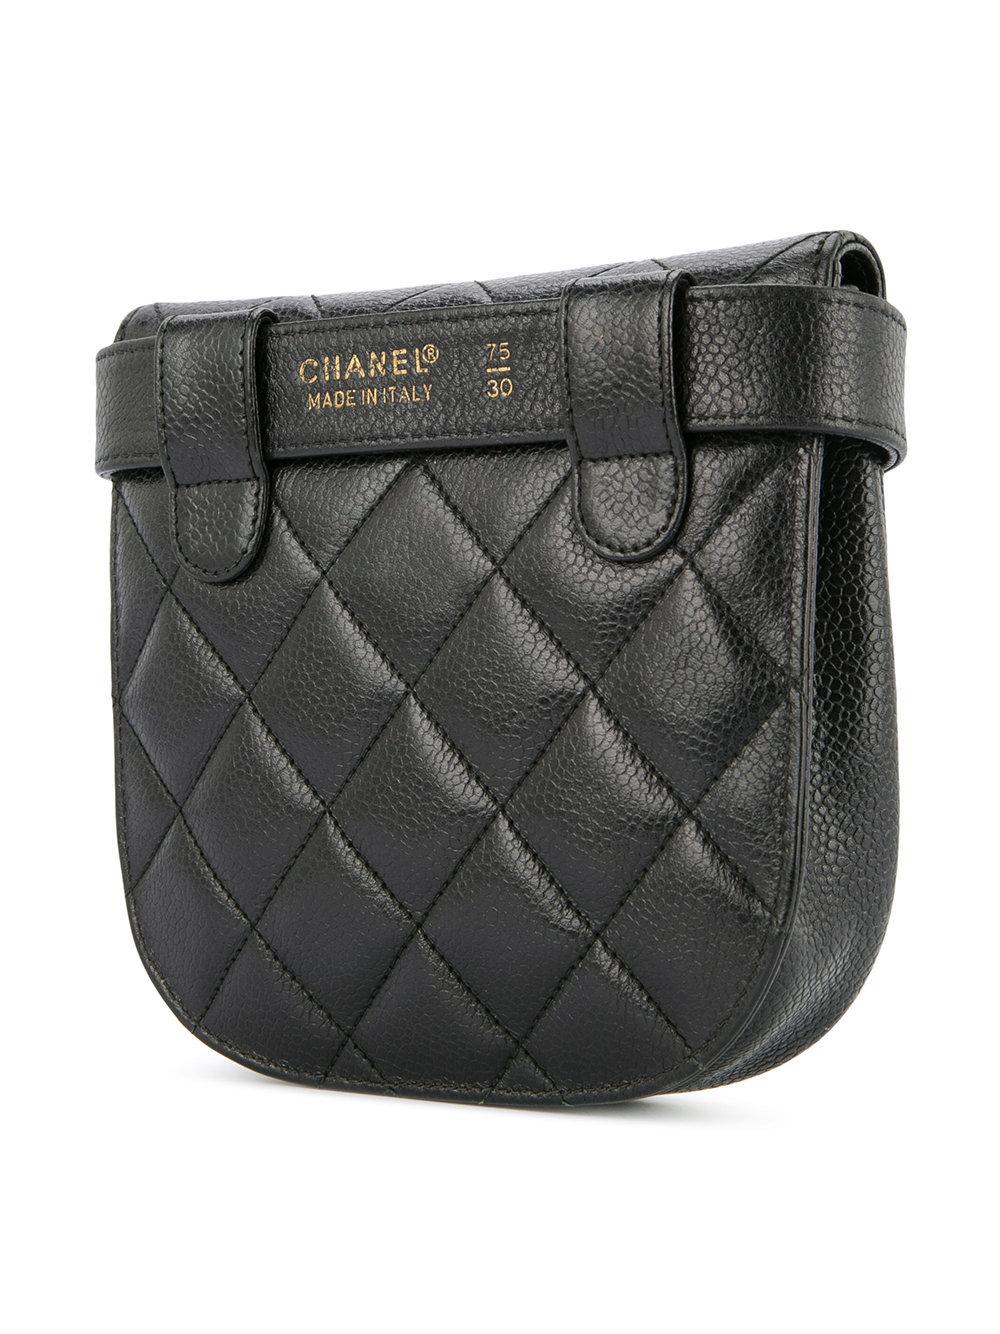 7243c90f5d8e70 Chanel Vintage Diamond Quilted Belt Bag, $6,383 | farfetch.com ...